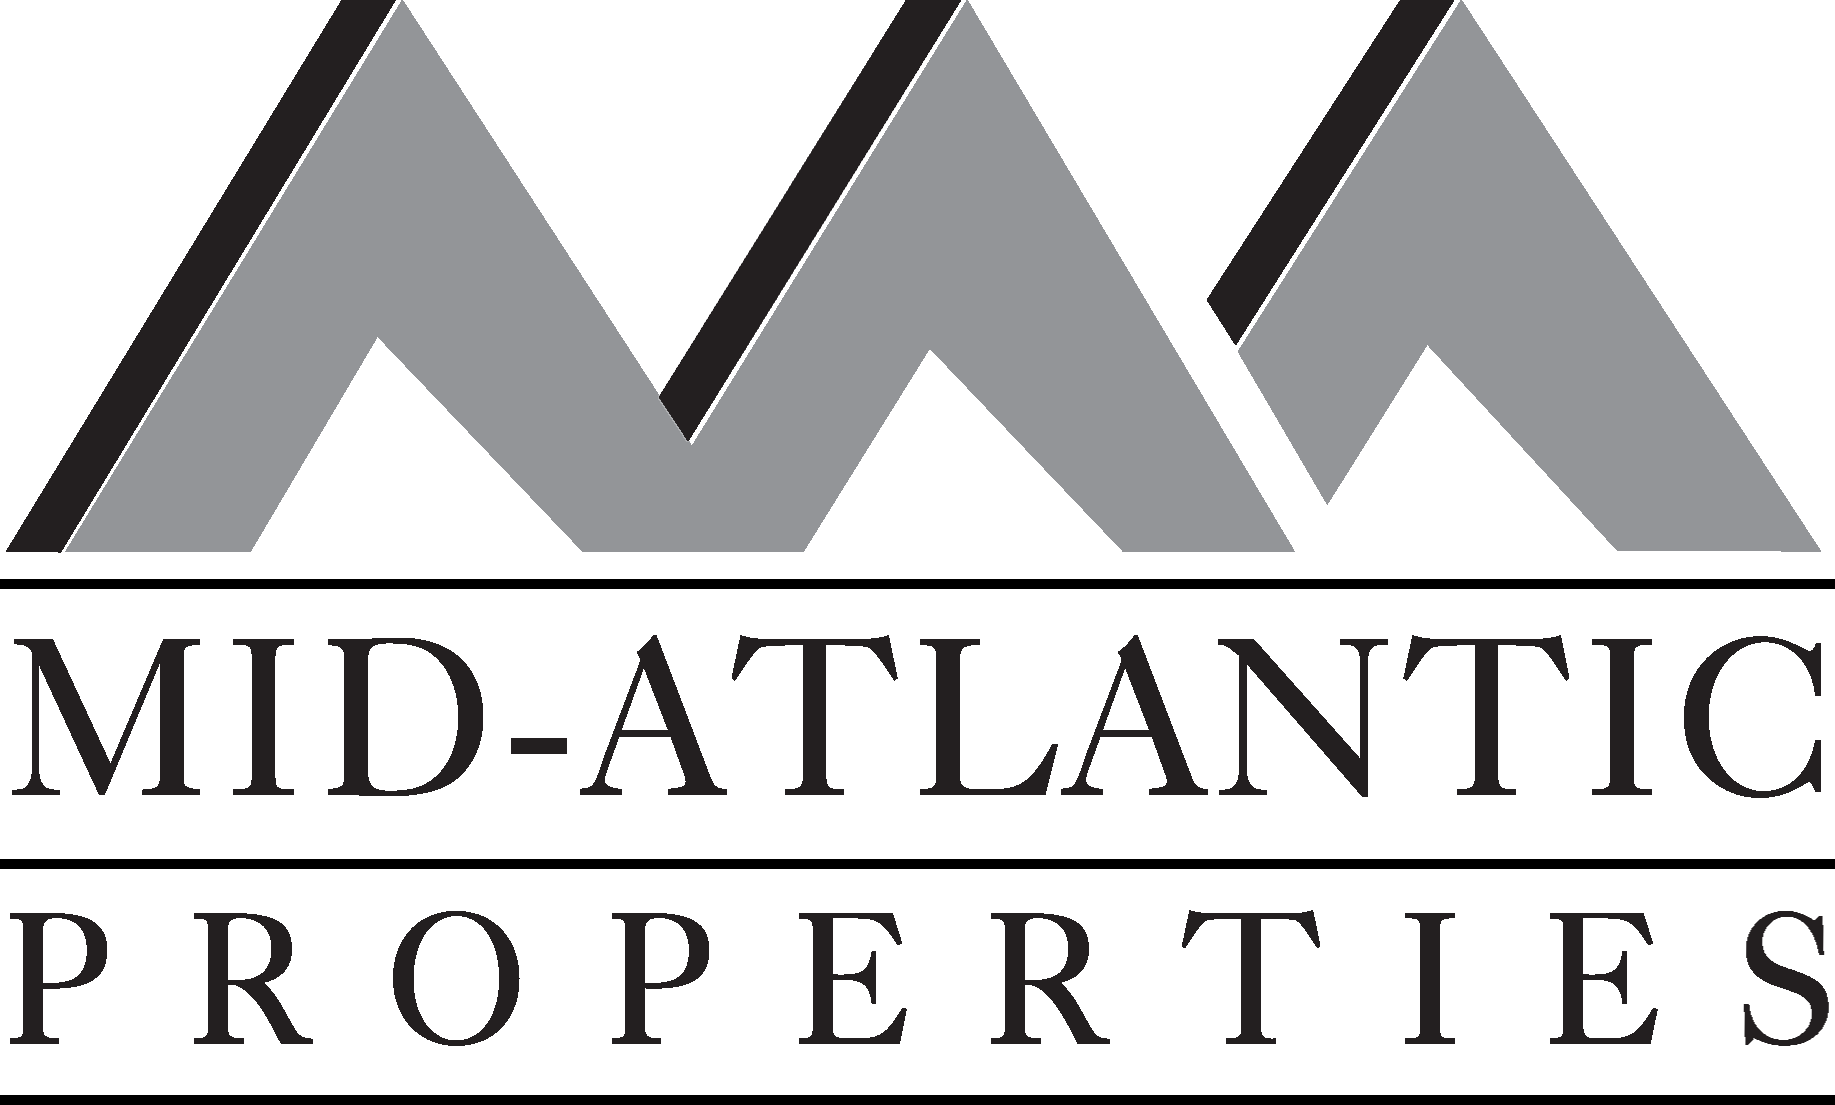 MIDAP Corrected Logo photoshop file (black writing).png